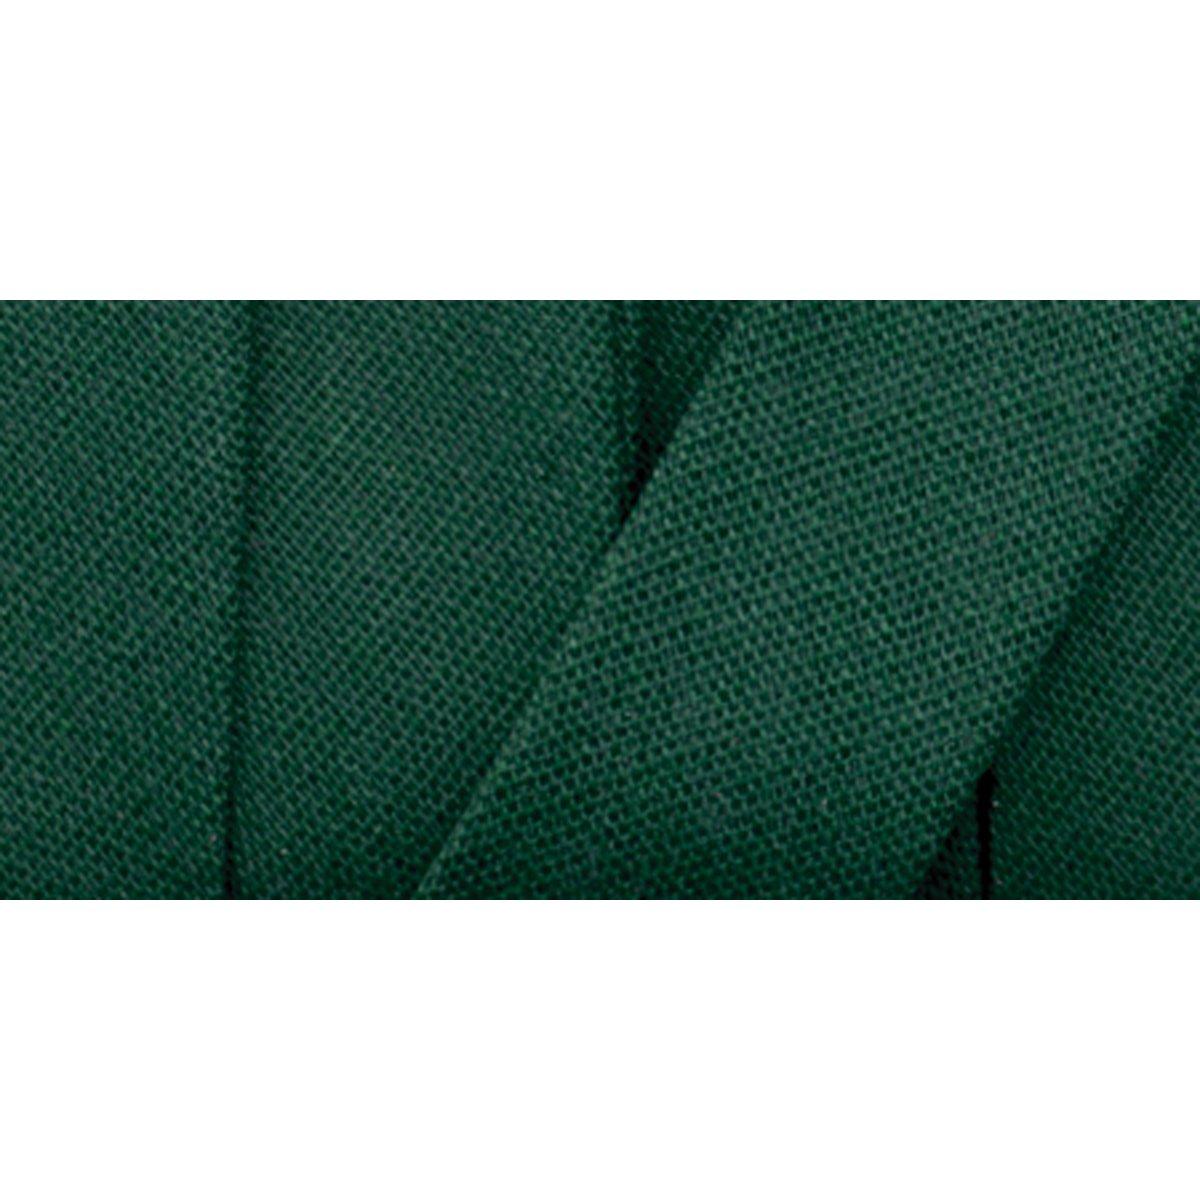 Wrights 117-206-618 Extra Wide Double Fold Bias Tape Sea Foam 3-Yard